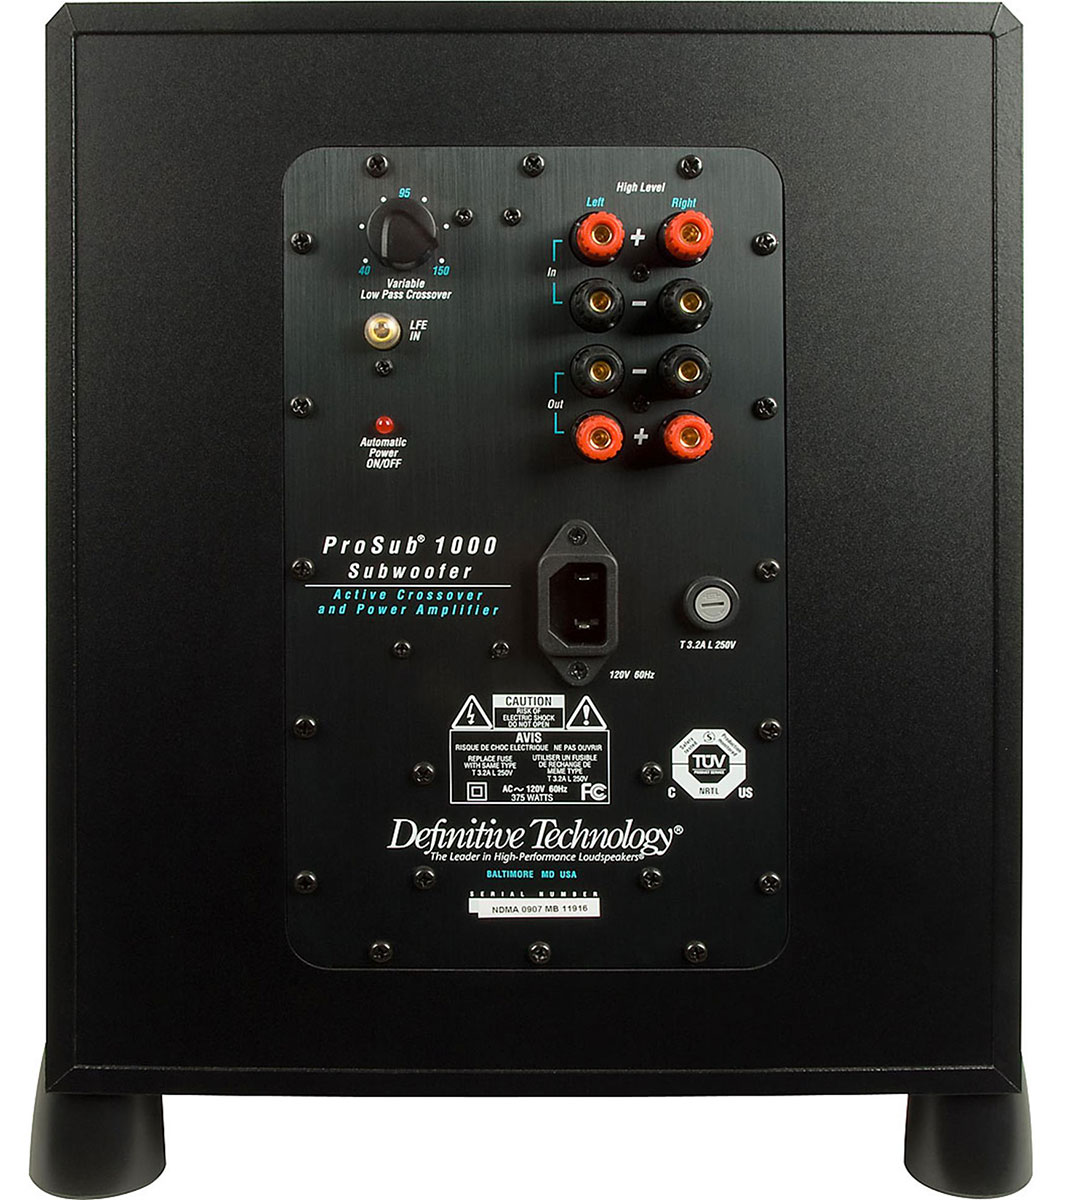 Definitive Technology Prosub1000 High Performance Compact